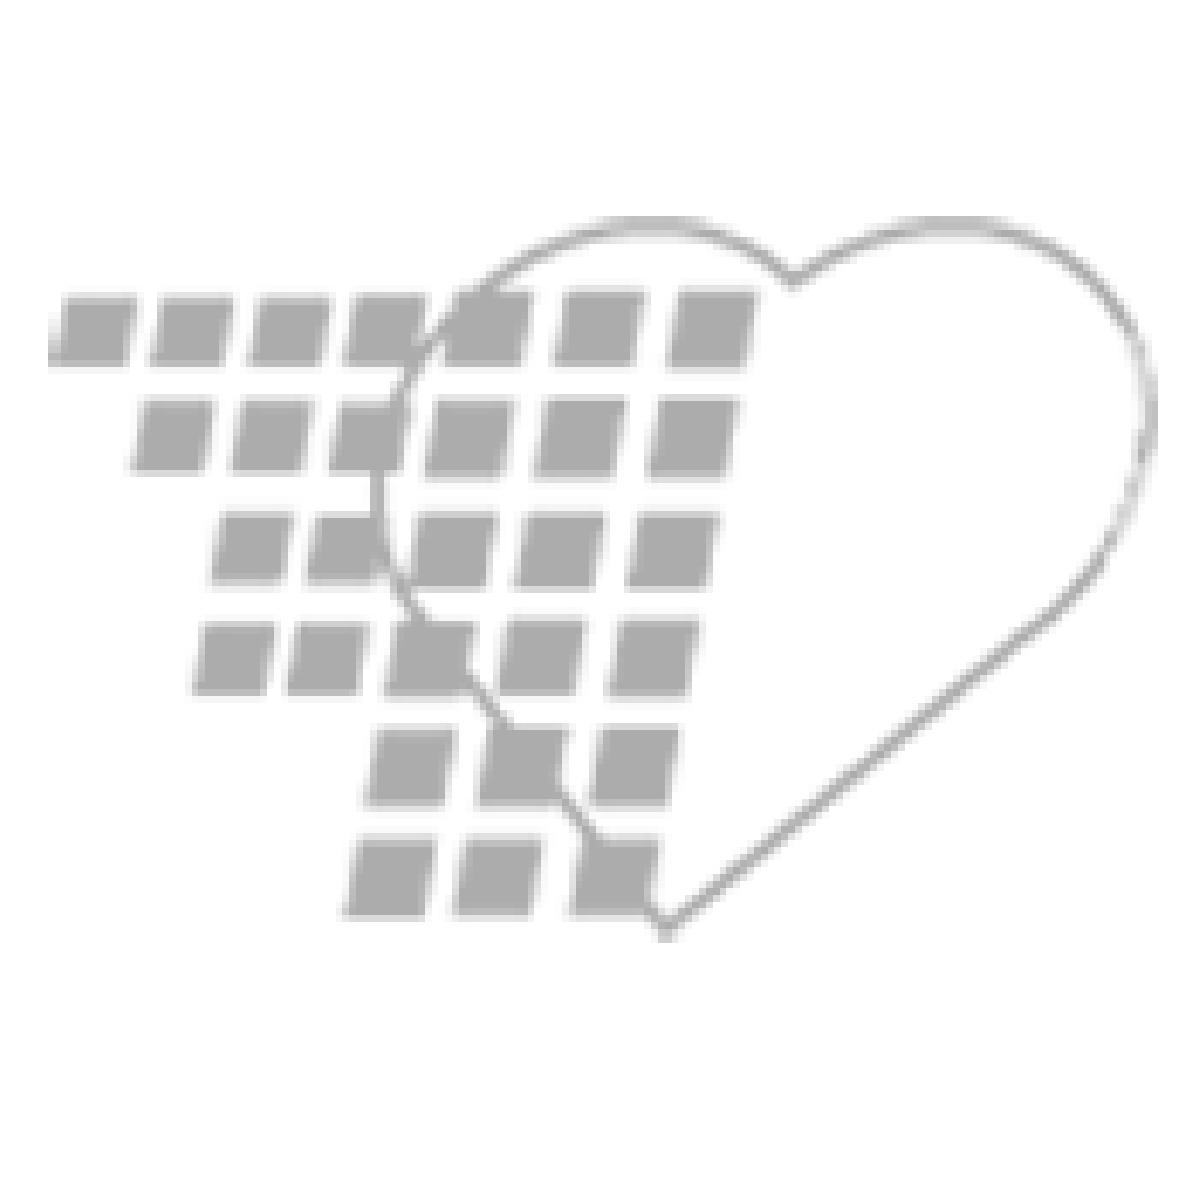 06-93-9030 - Demo Dose® Atenoll (Tenormn) 50 mg- 100/Bottle